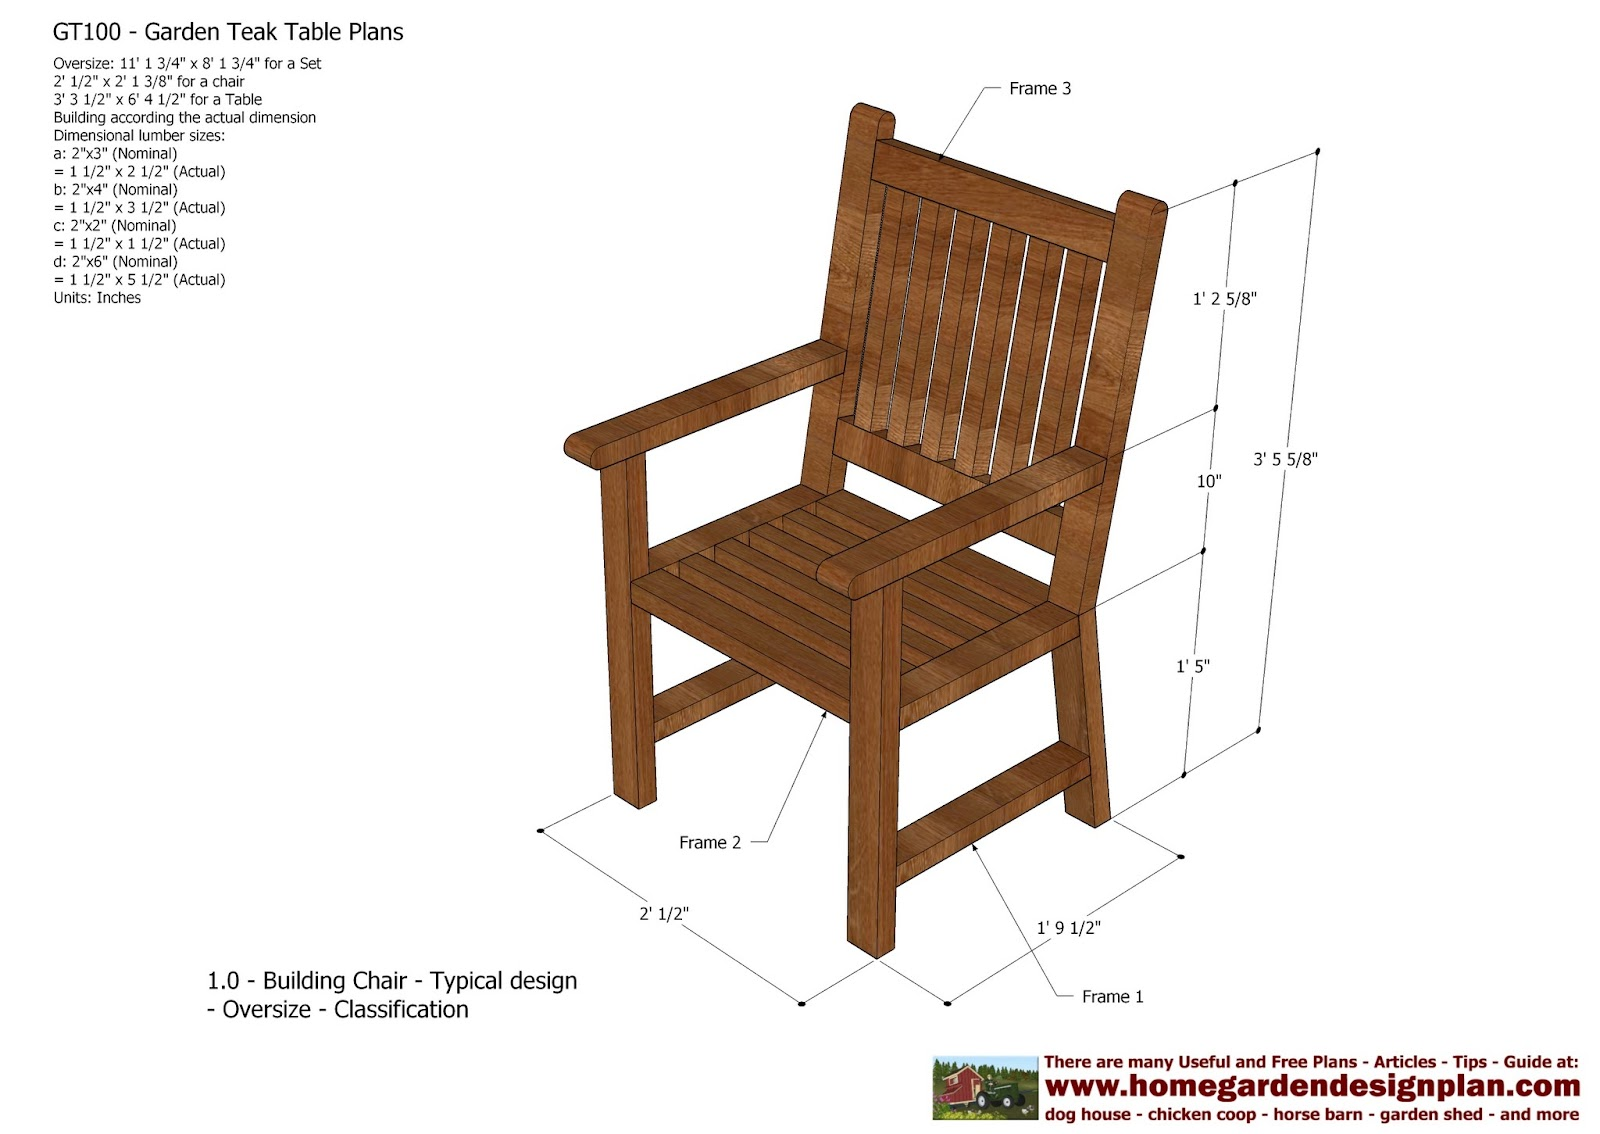 Wood Patio Chair Plans Infant Baby Beach Home Garden Gt100 Teak Tables